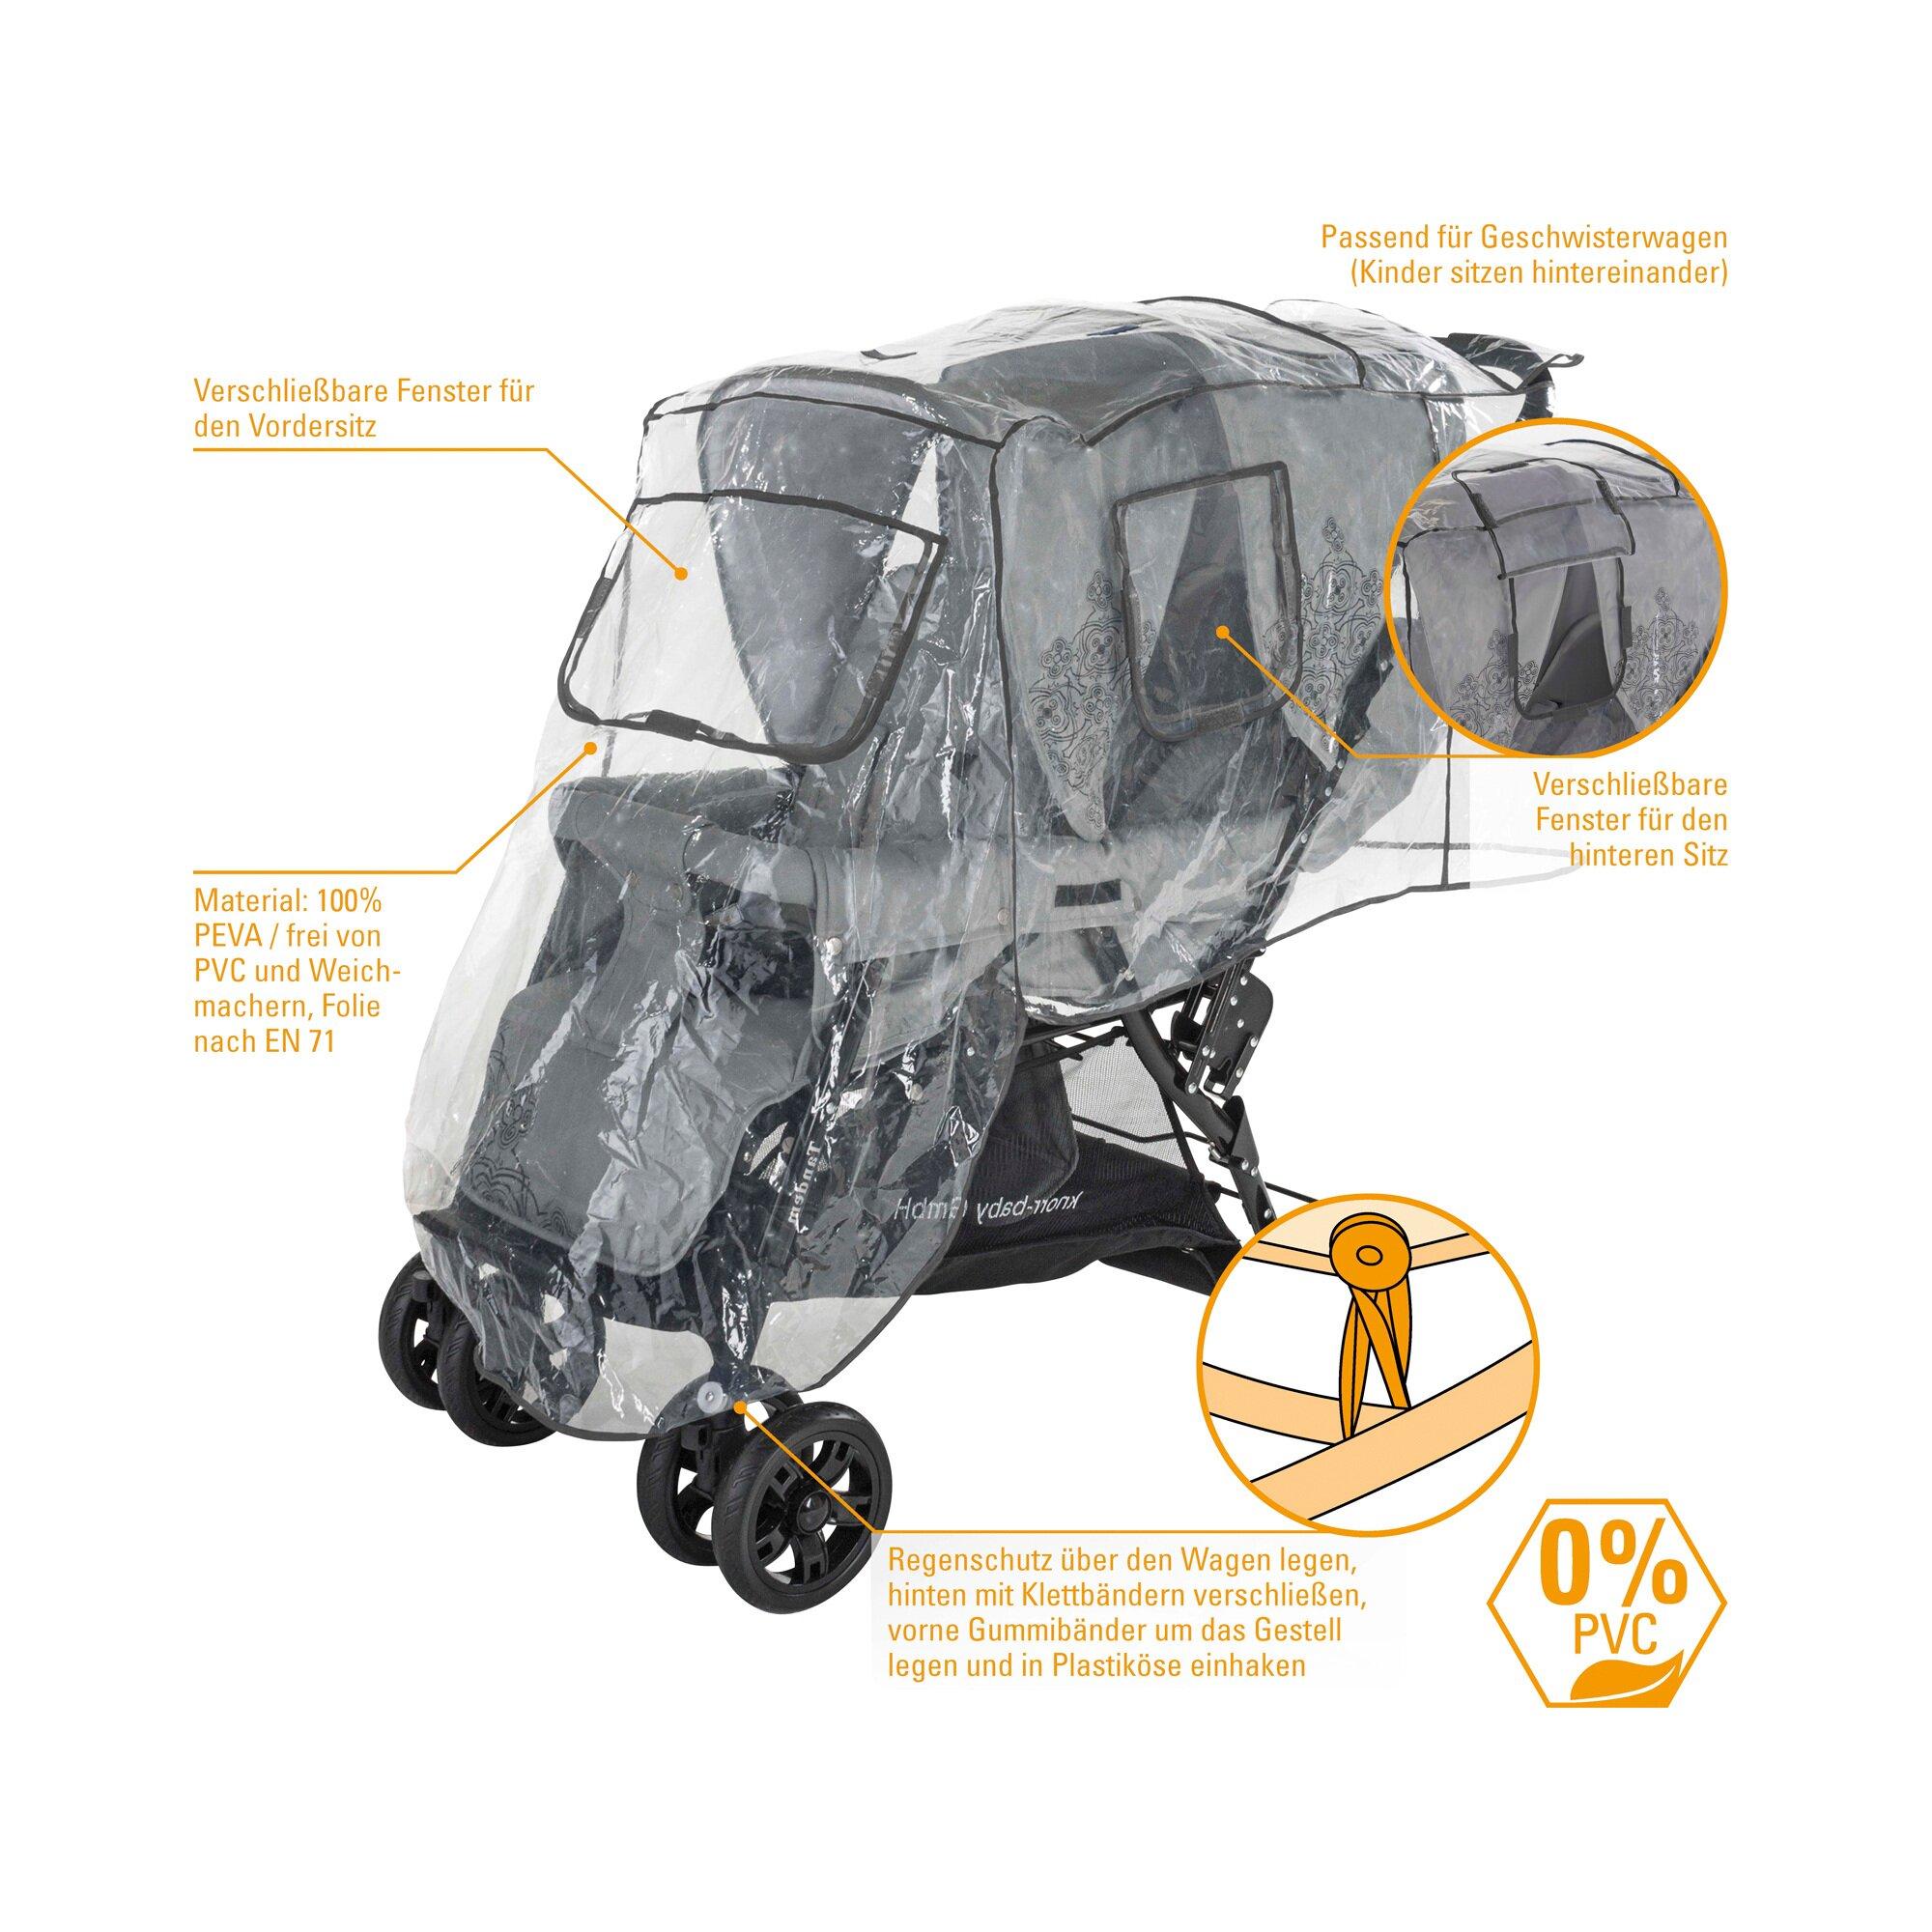 diago-regenschutz-fur-kinderwagen-geschwisterwagen-transparent